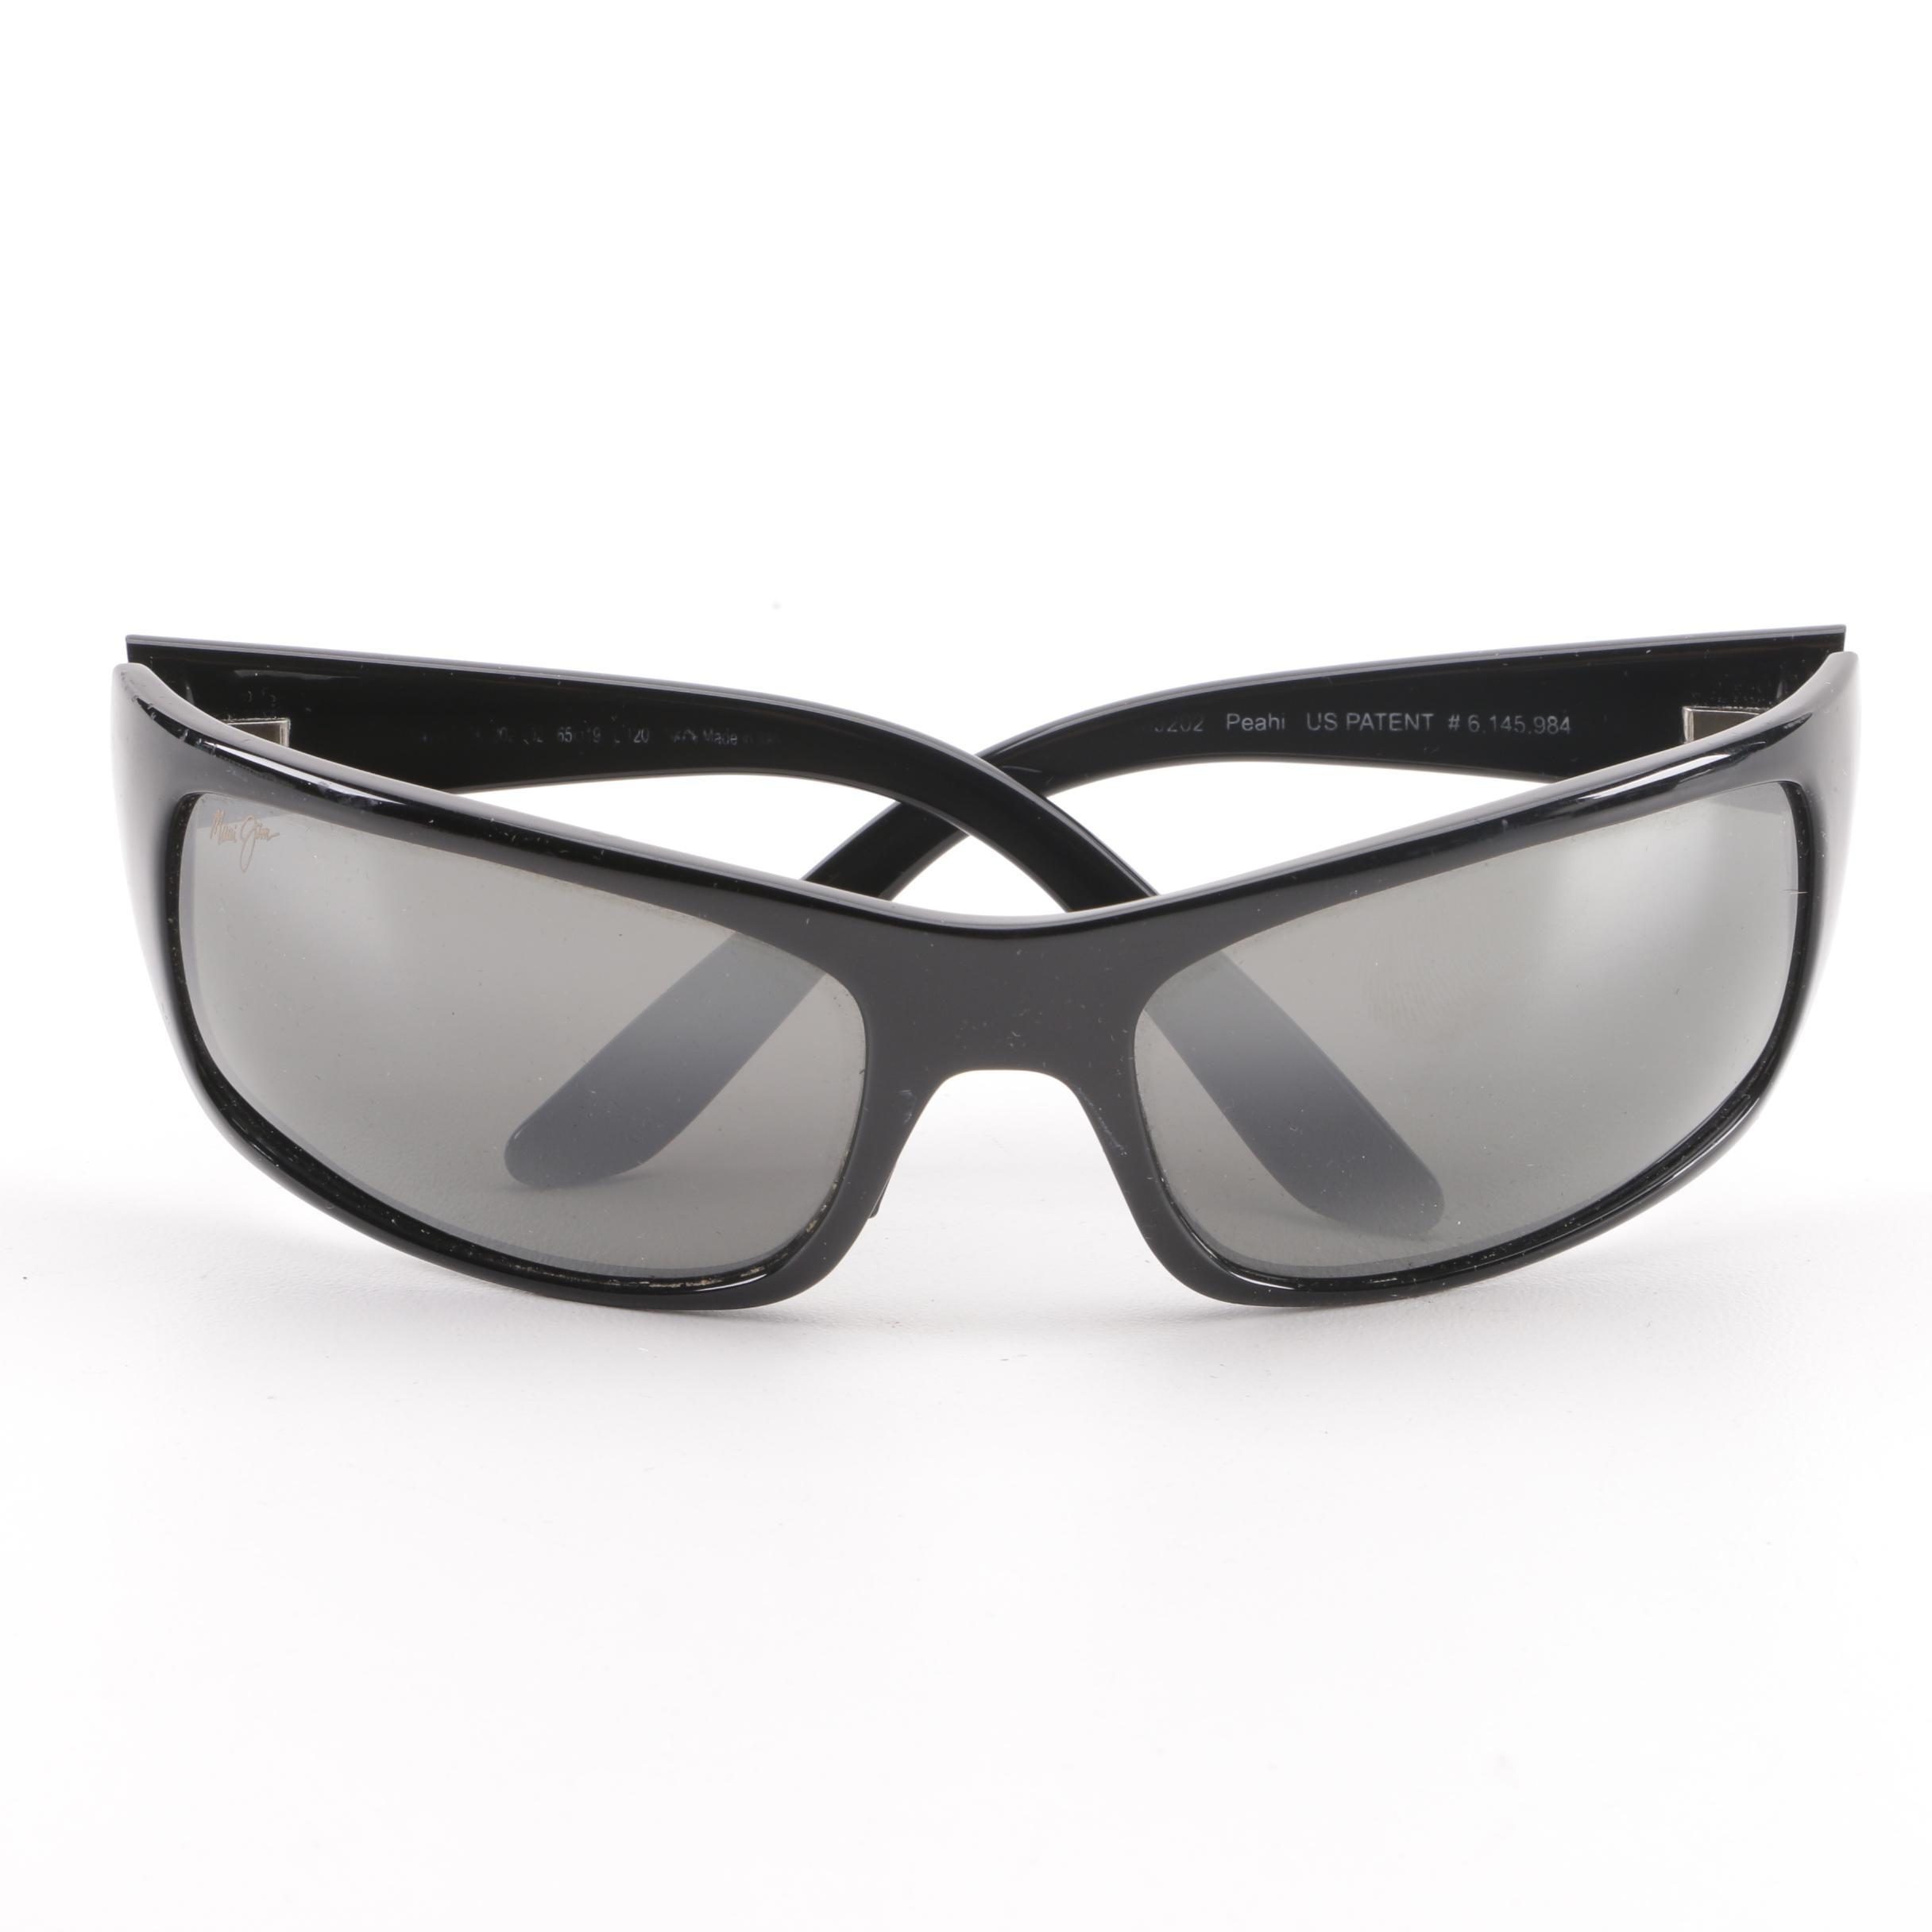 Maui Jim Black Peahi Sunglasses